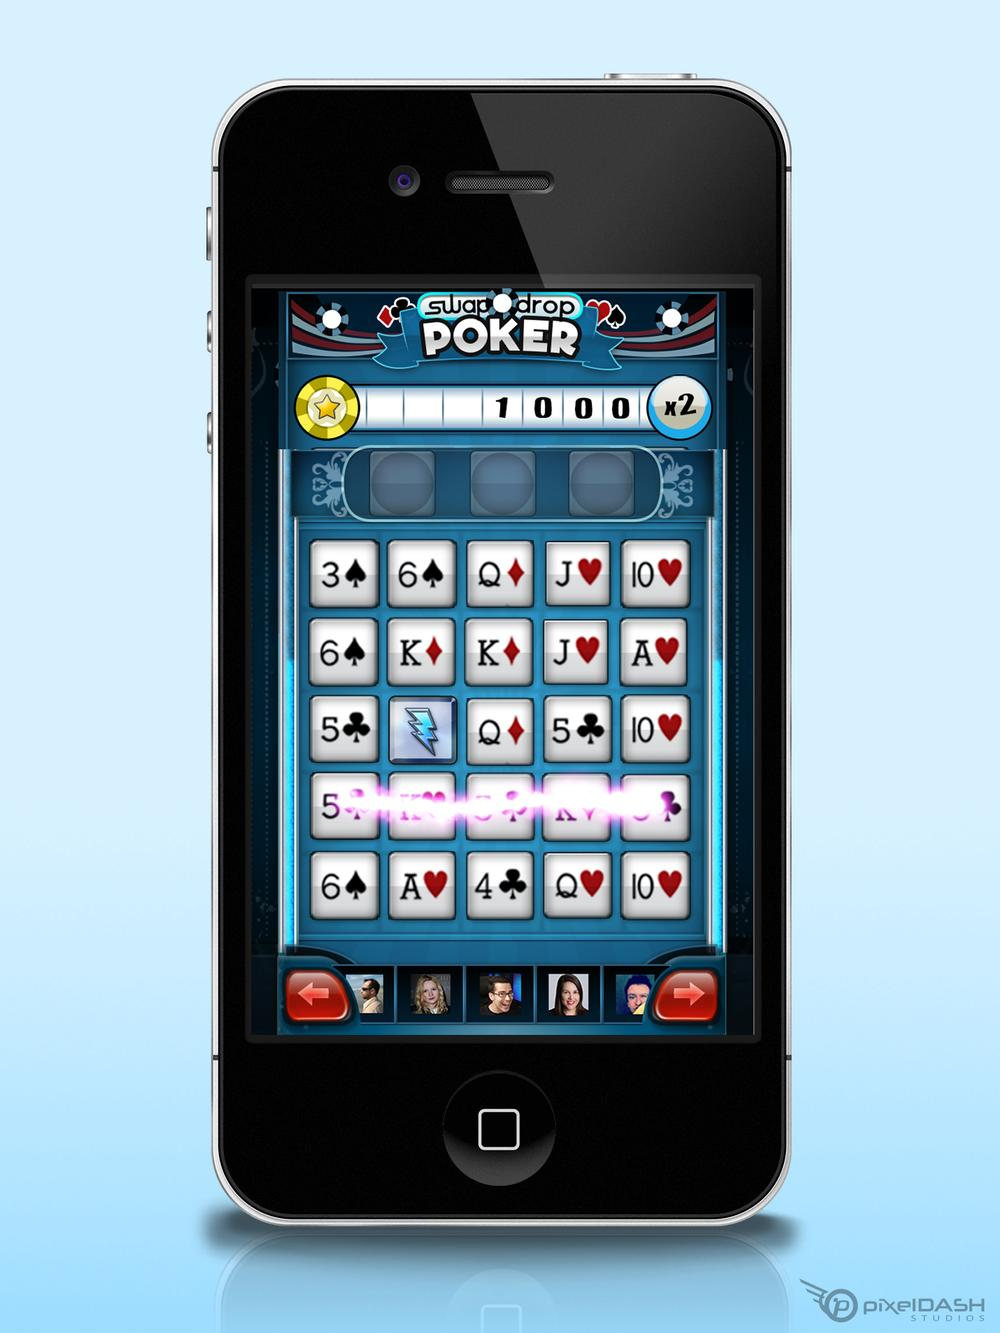 Kdr5g2jtxmdyeu2uwrt6_swap_drop_poker_01_1000